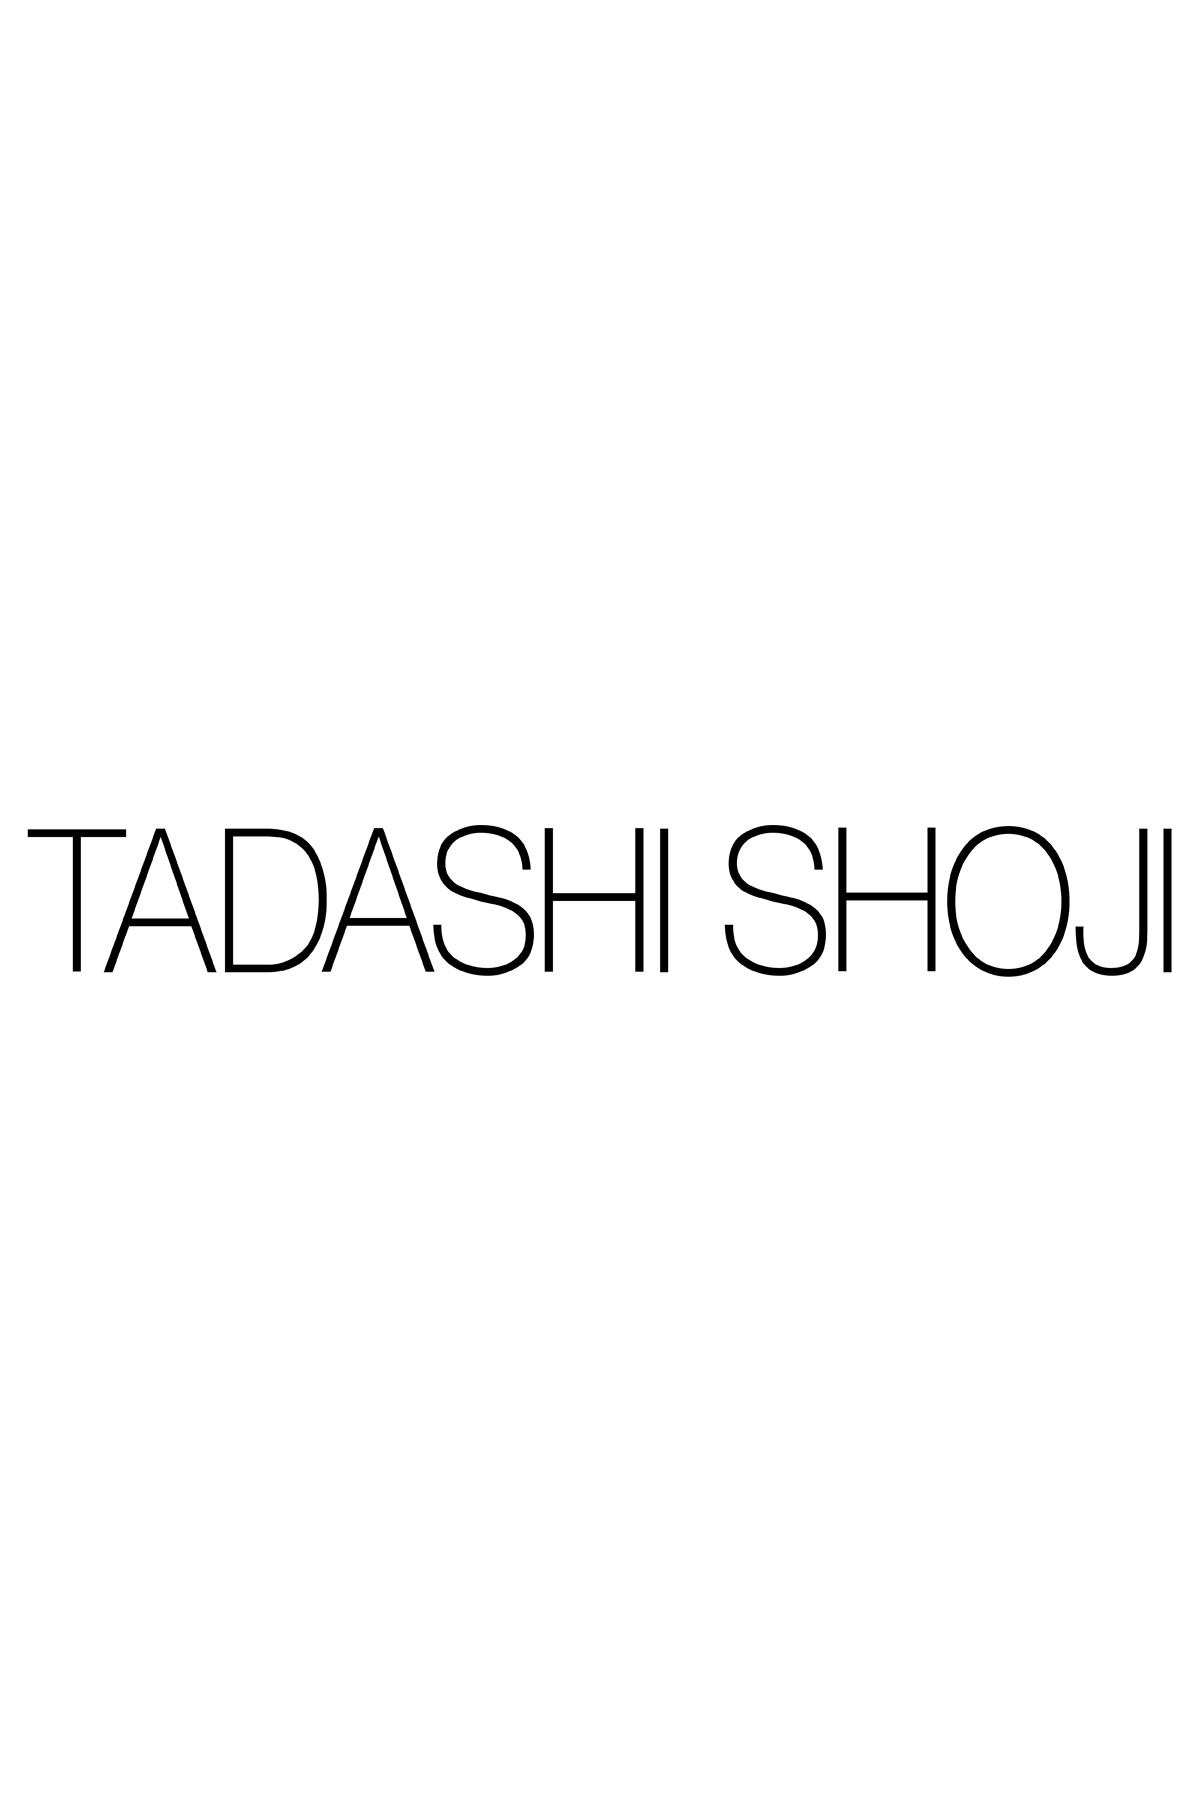 Tadashi Shoji - Yama Dress - Detail